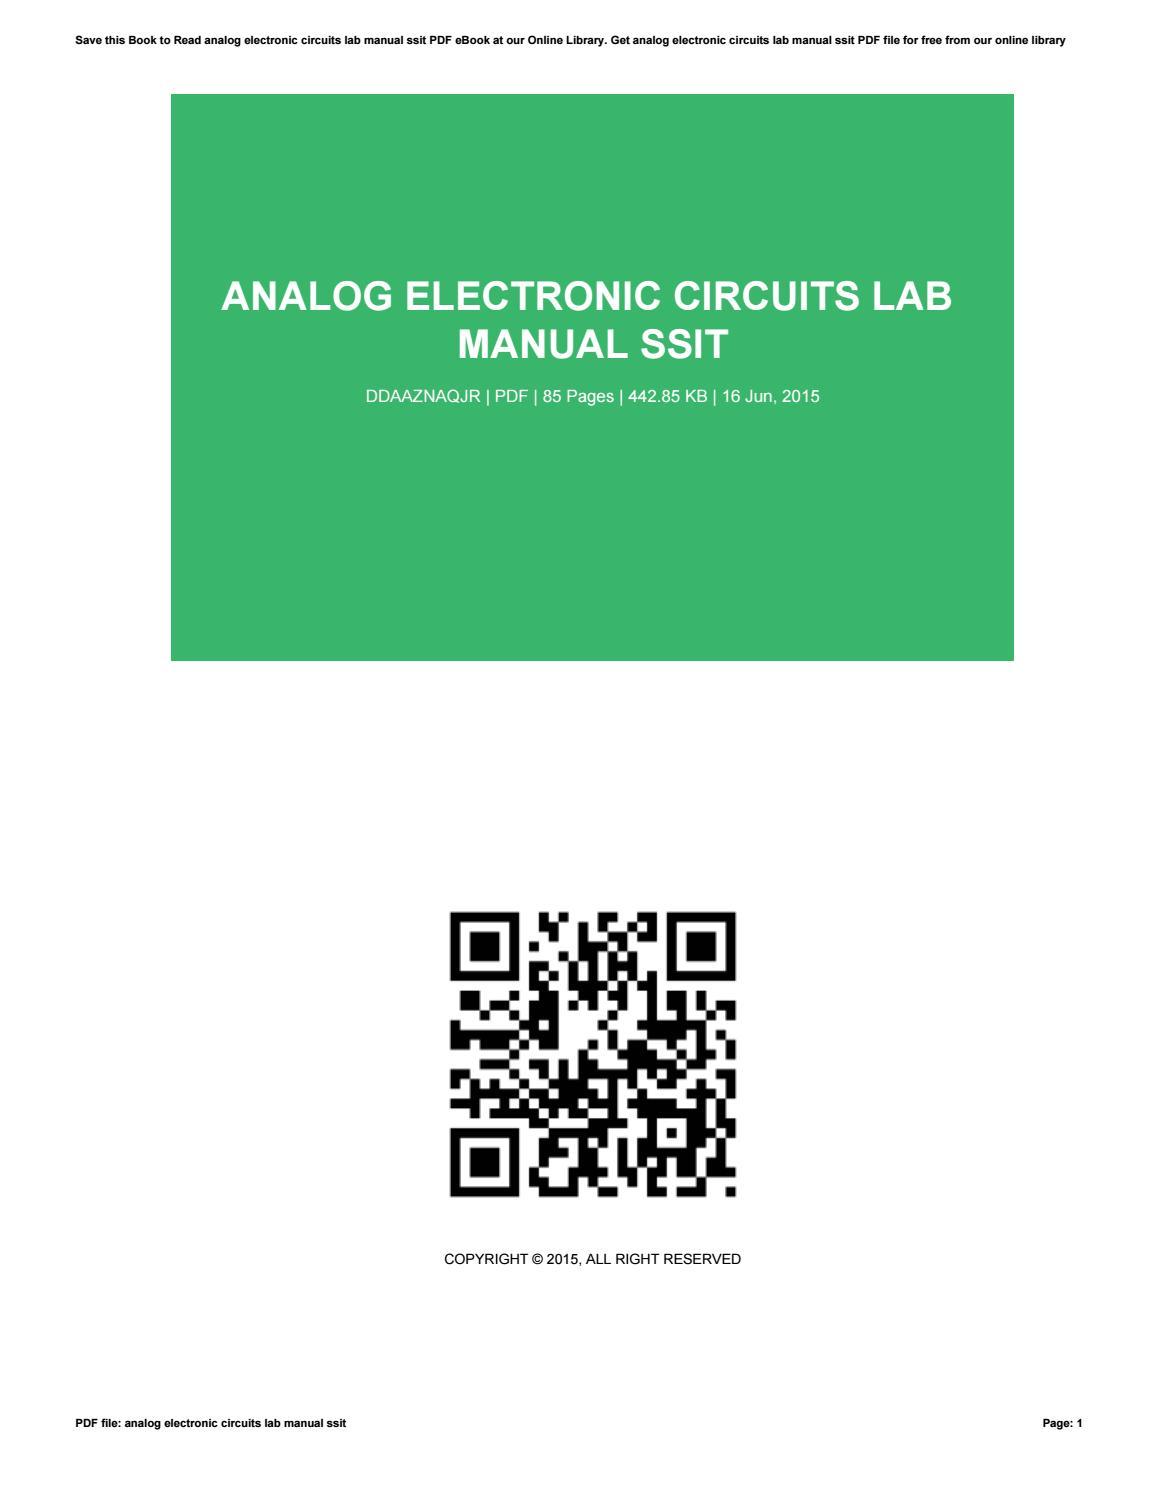 Analog Electronic Circuits Lab Manual Ssit By Richardlevesque3378 Understanding Pdf Issuu